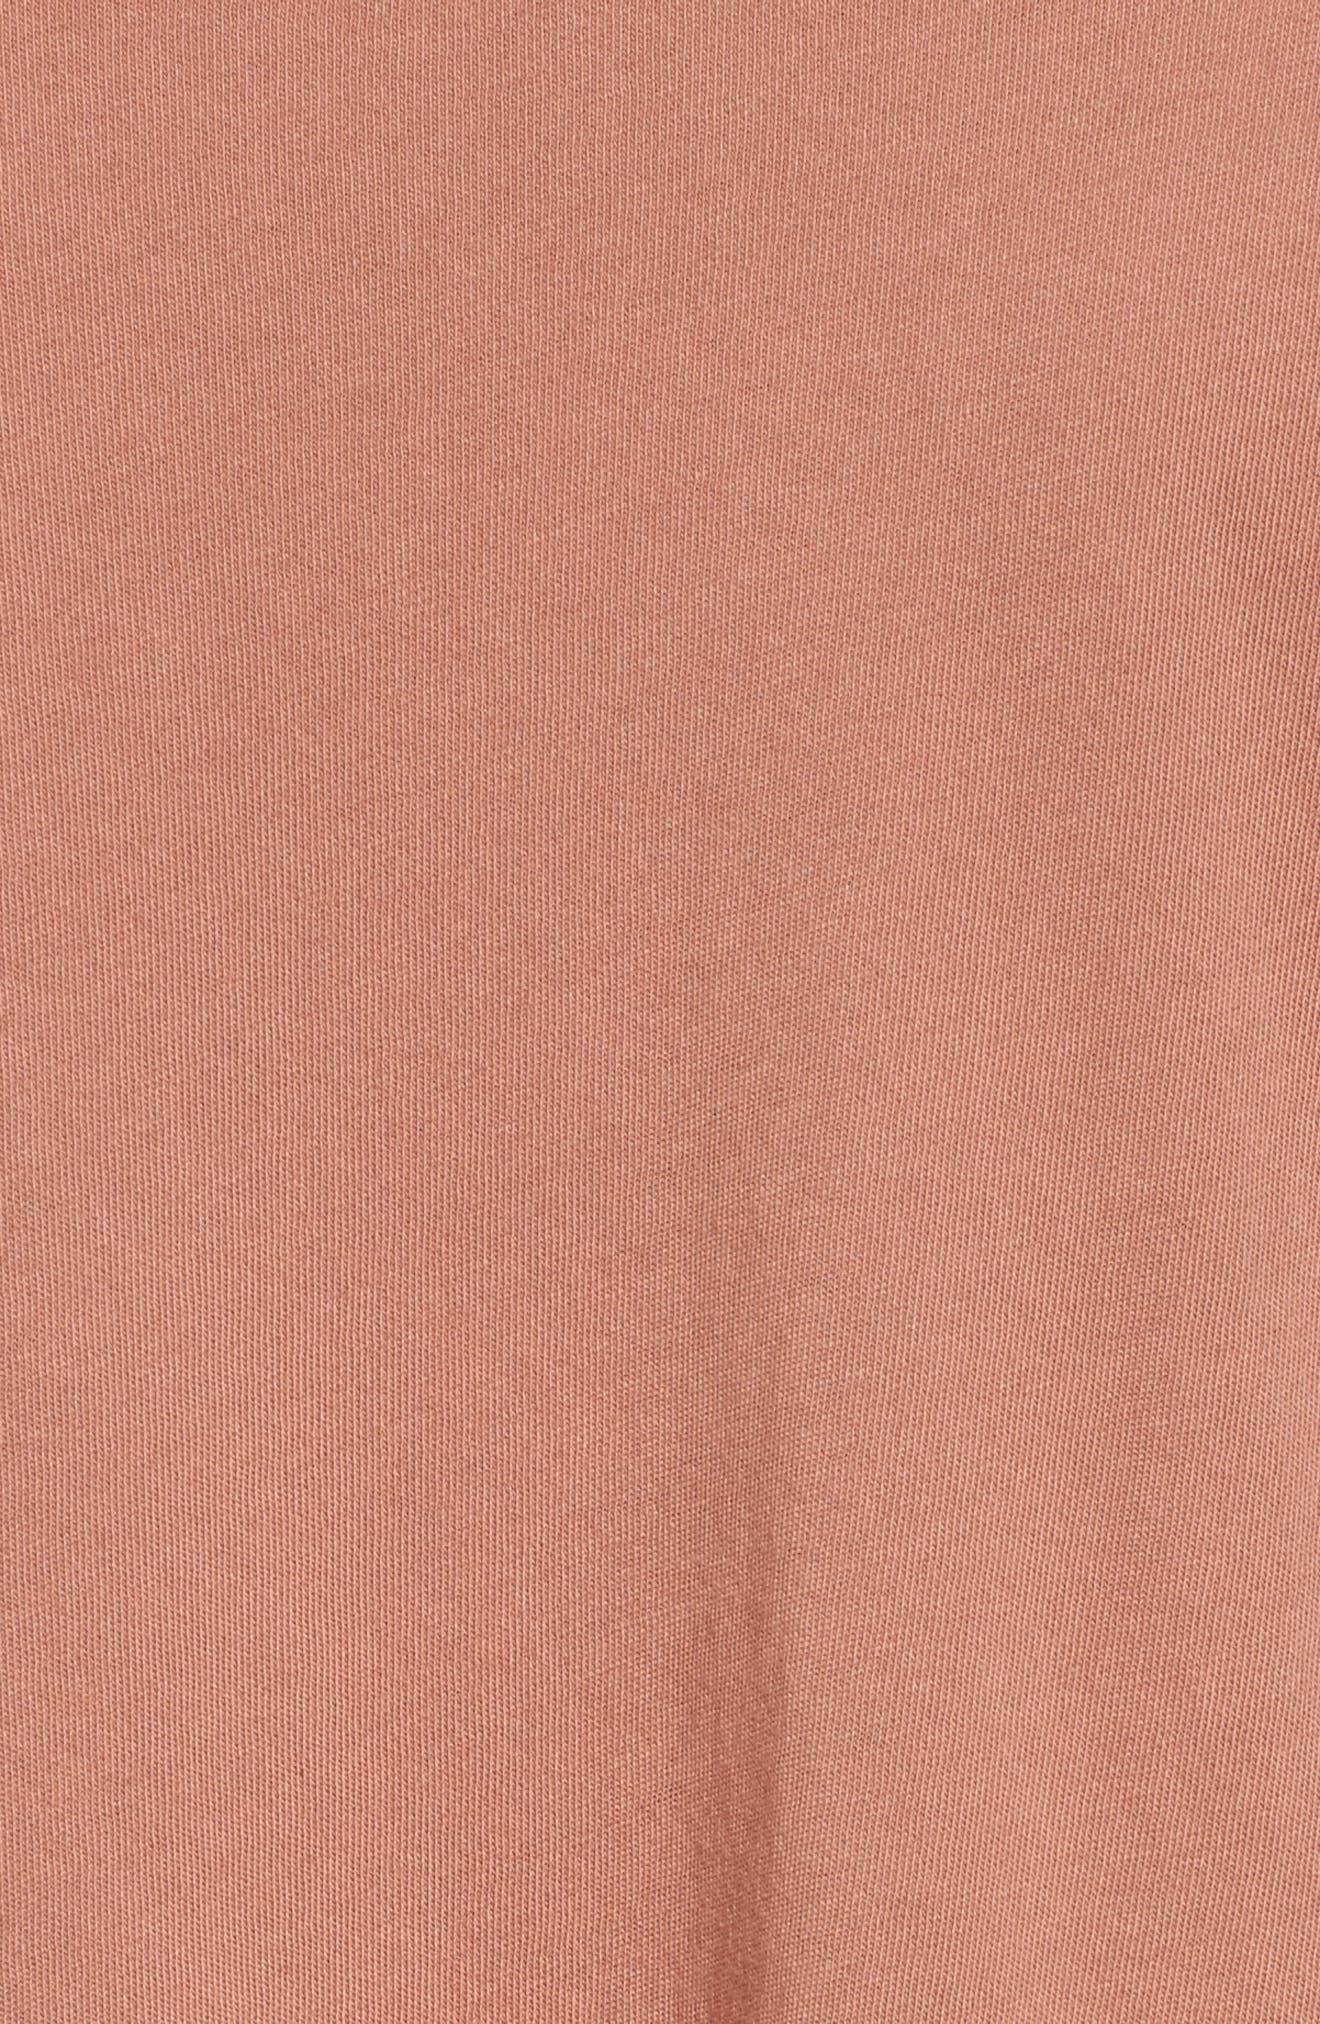 Abigail Knit Dress,                             Alternate thumbnail 5, color,                             654